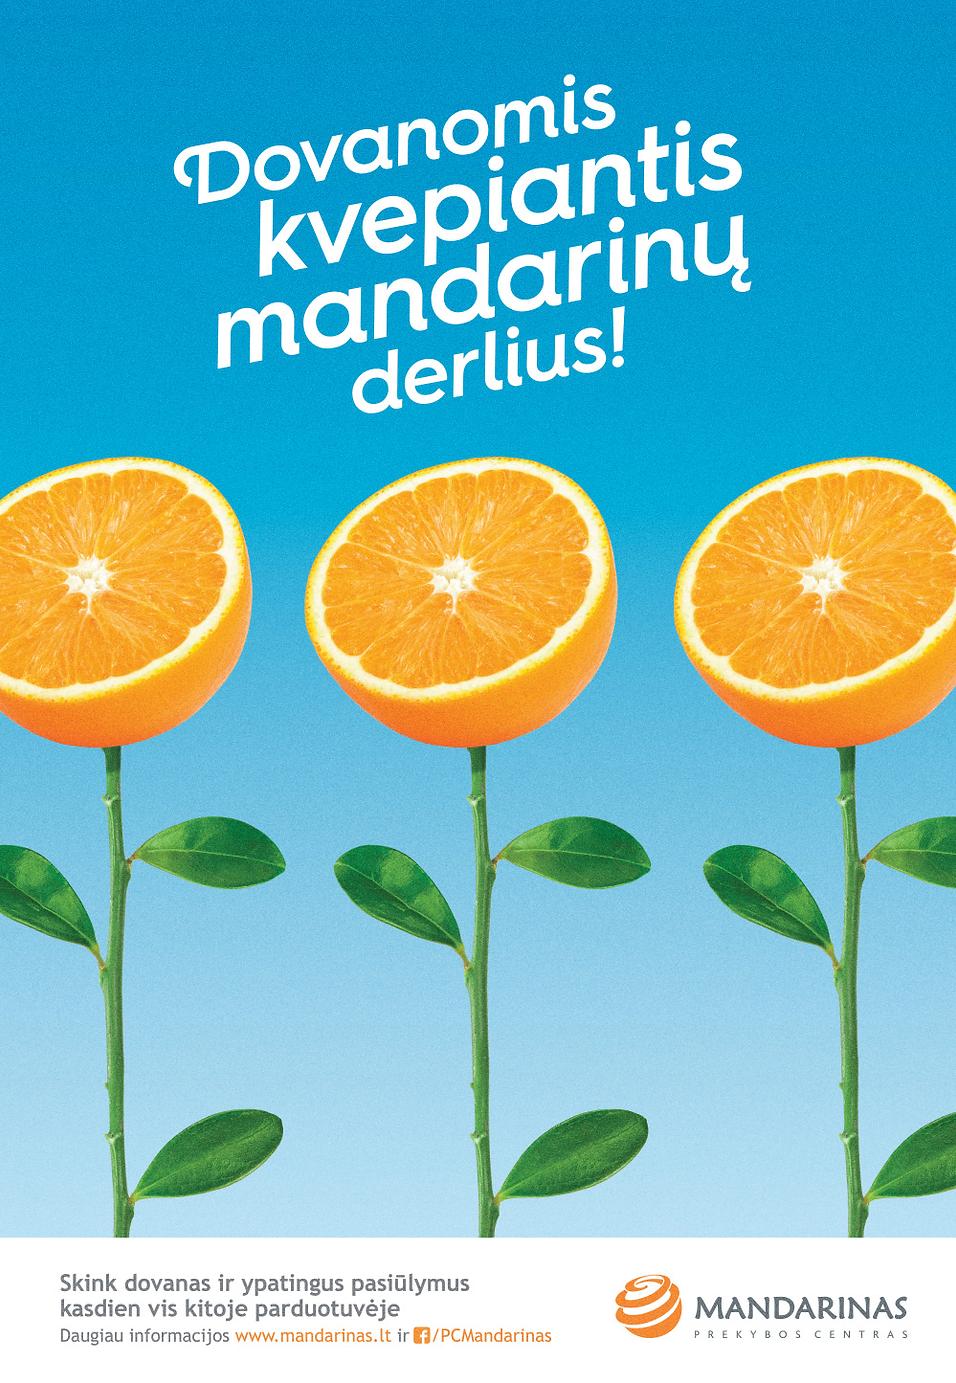 mandarinu derlius plakatas.png